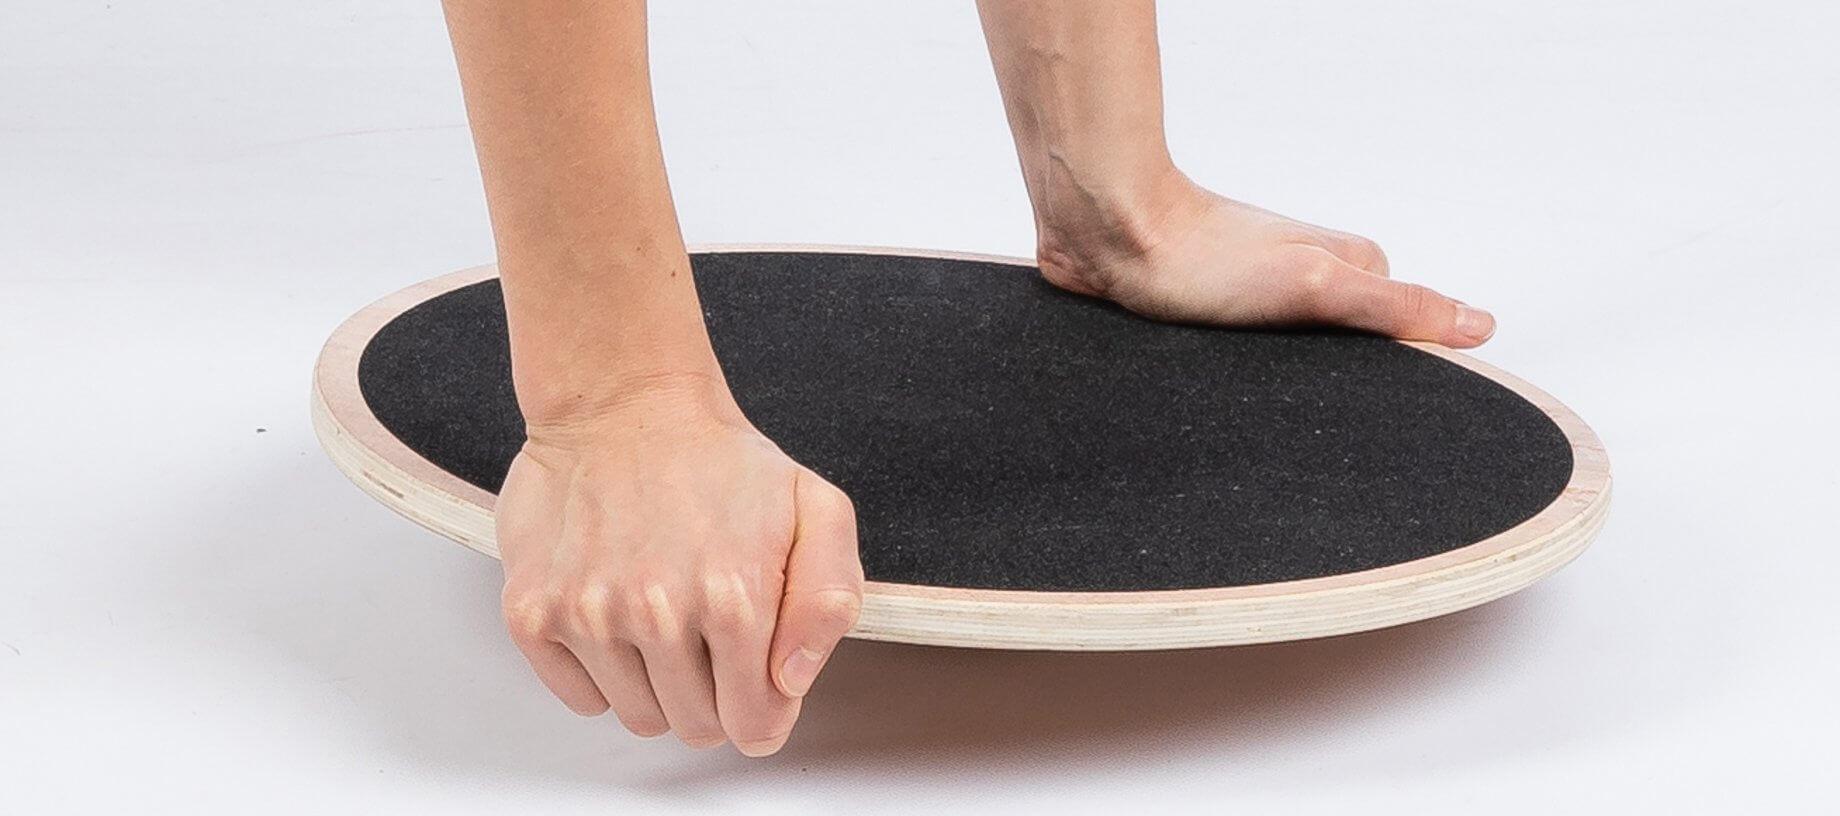 Top 5 Balance Board Exercises